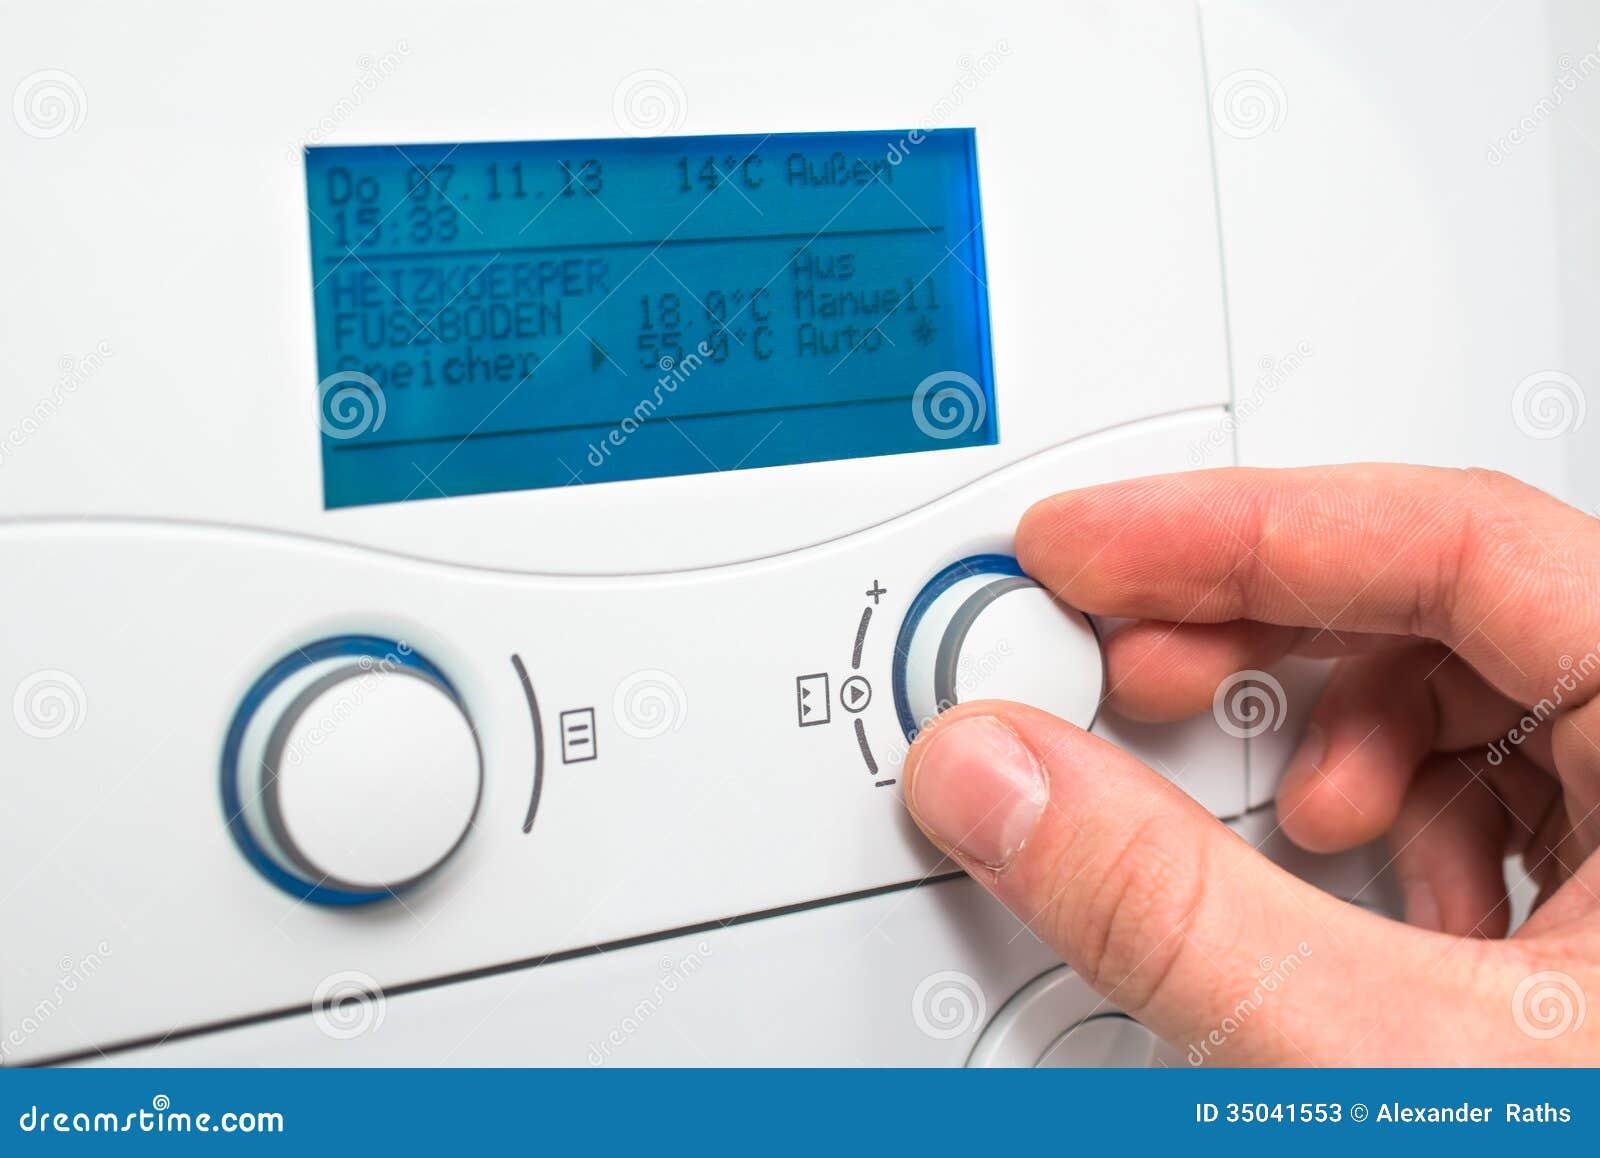 Heating boiler stock image. Image of boiler, control - 35041553